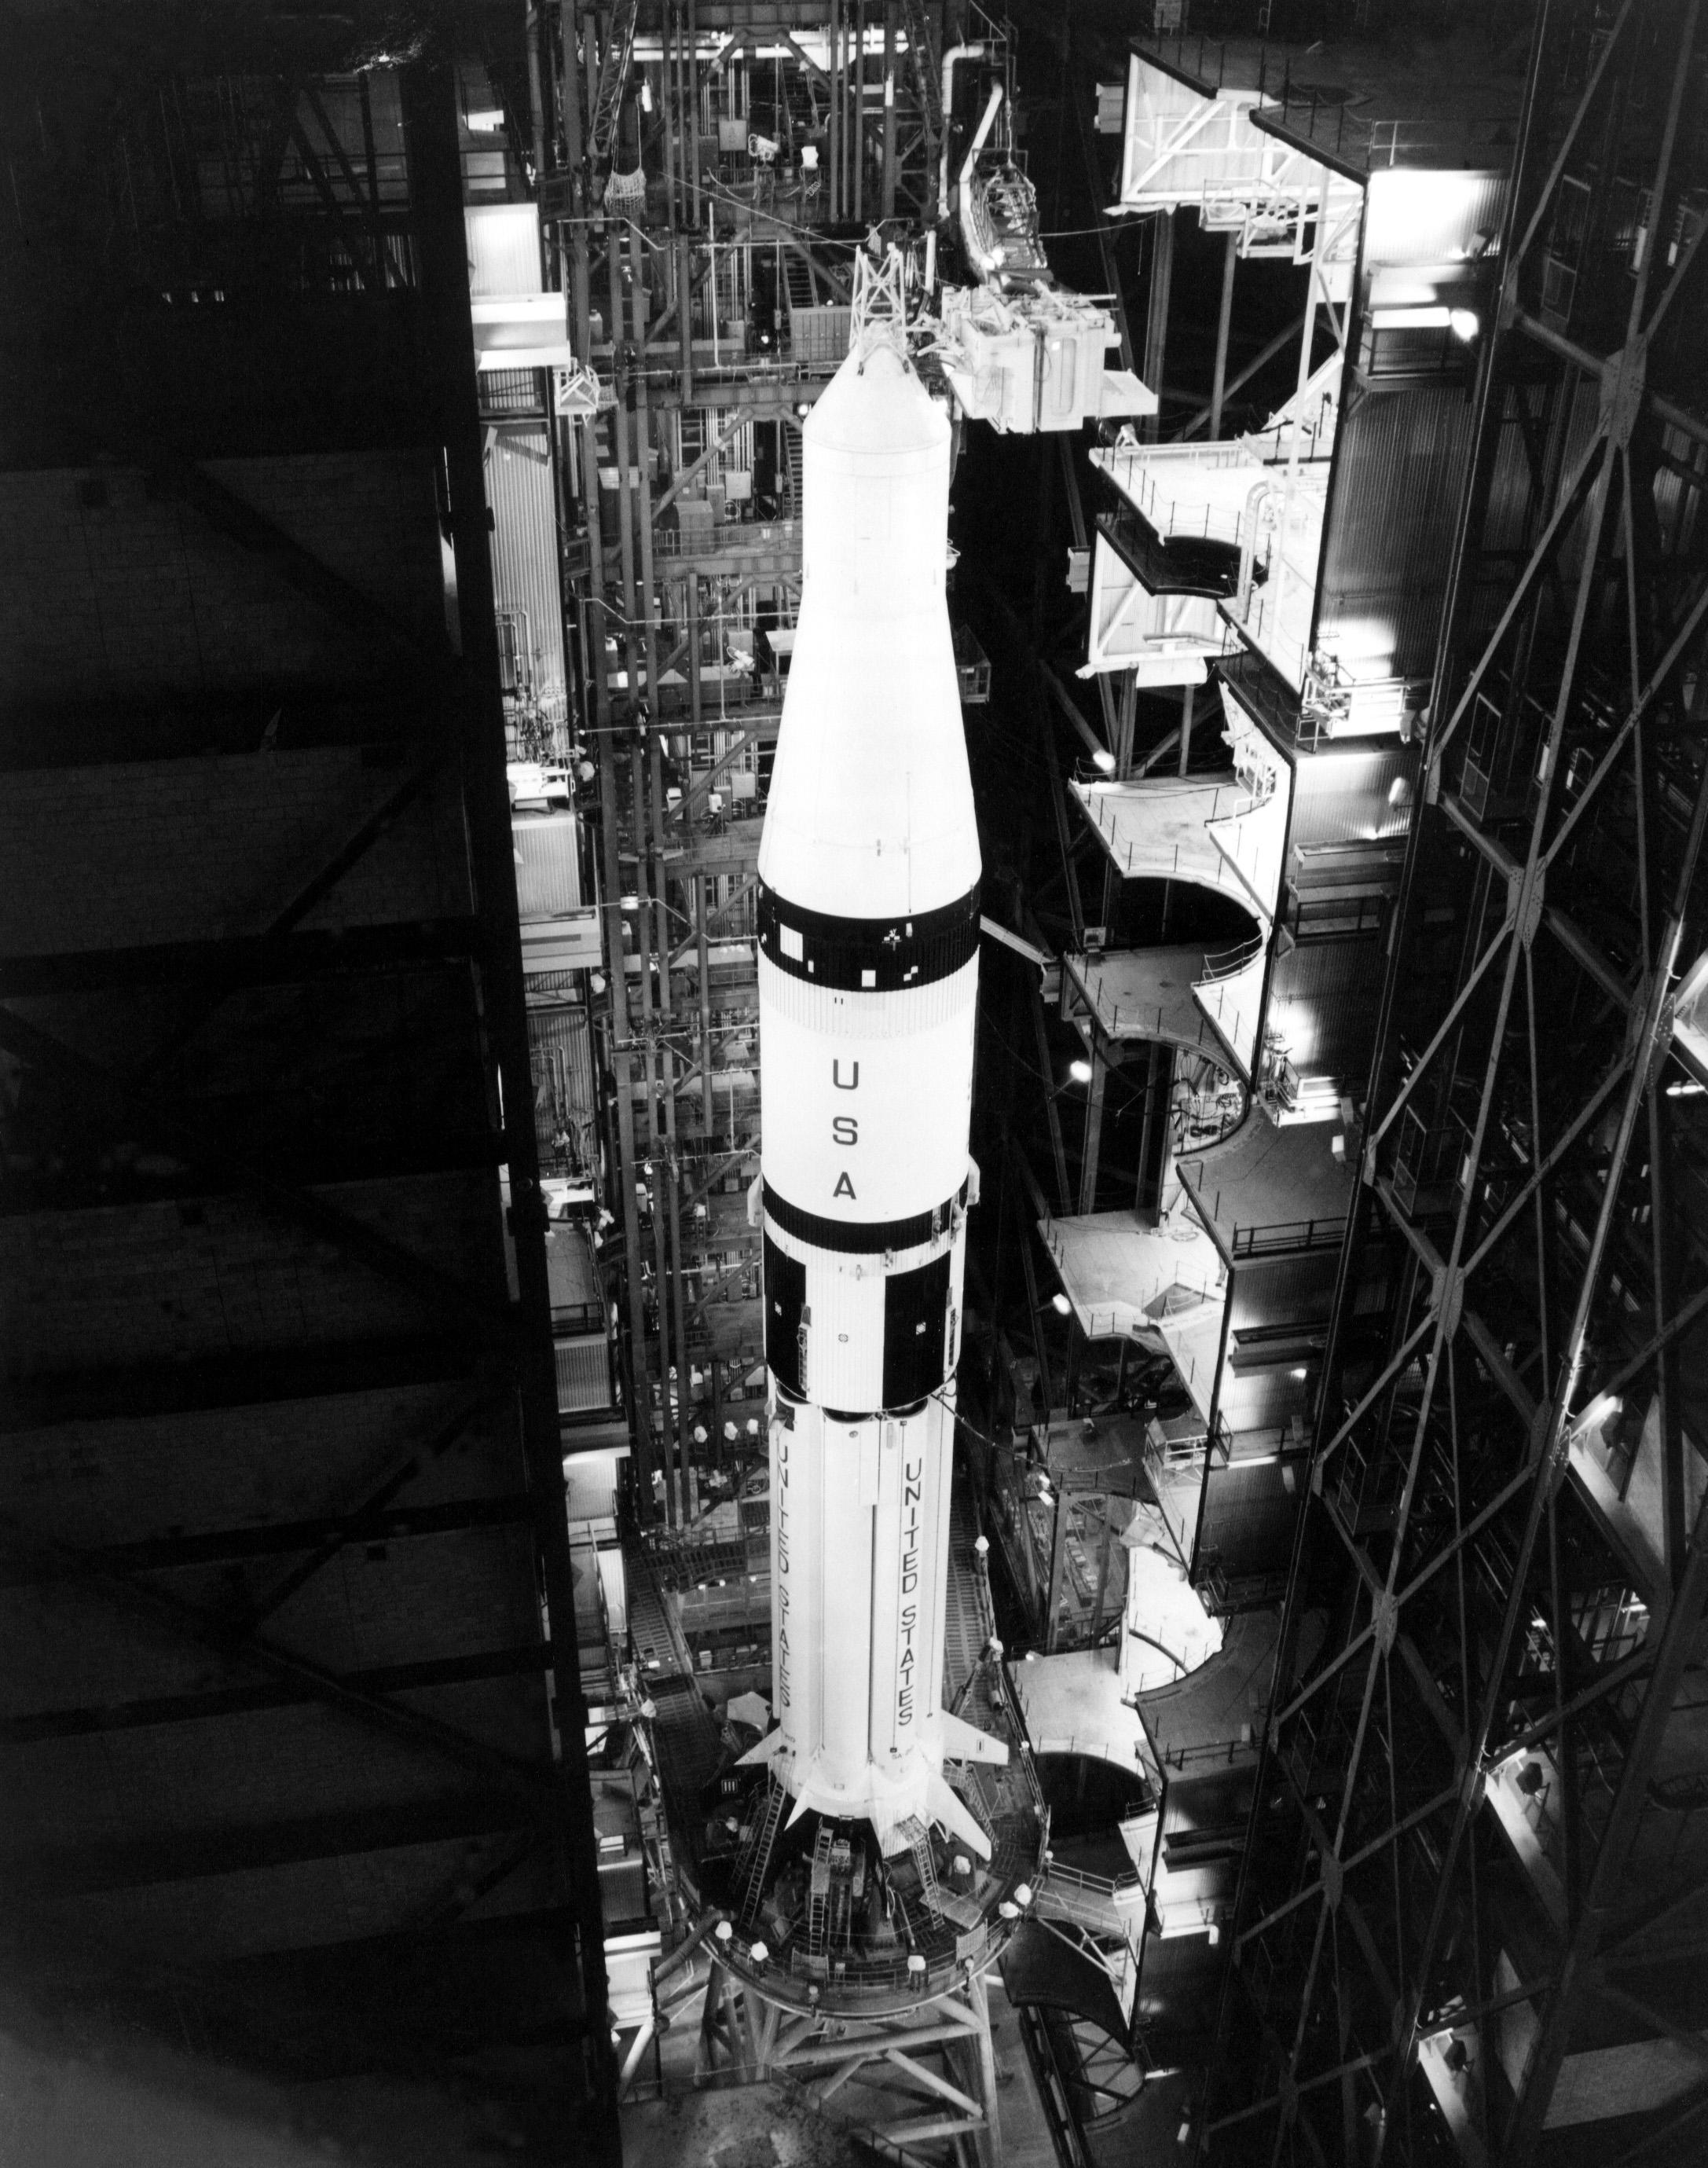 File:Apollo-Soyuz Test Project, Saturn IB with boilerplate ...